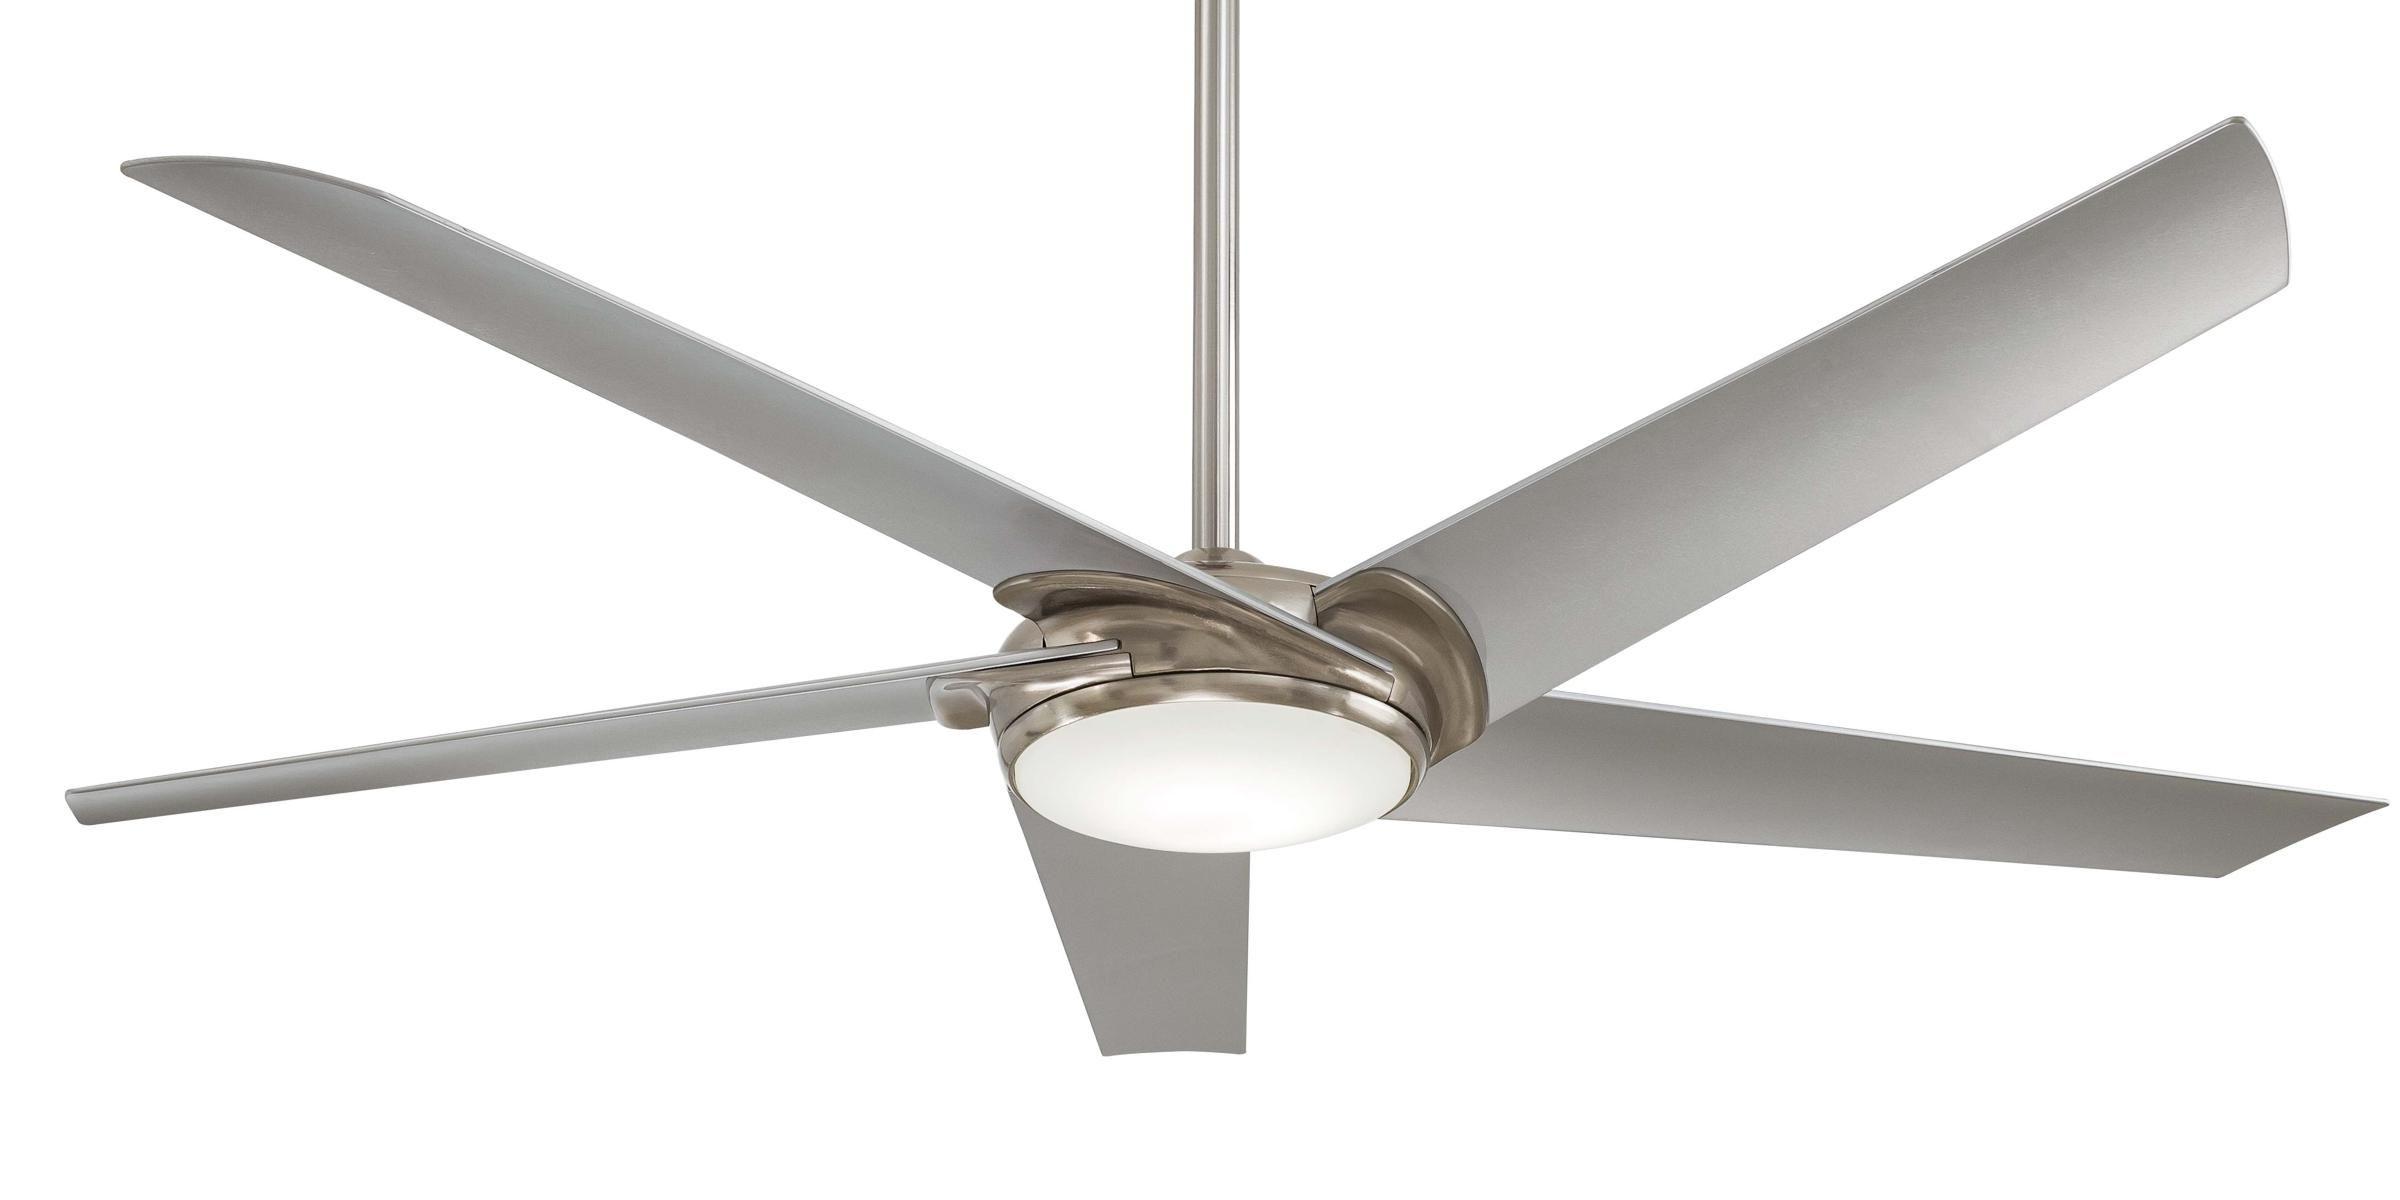 Minka Aire Raptor Ceiling Fan F617 BN in Brushed Nickel Guaranteed